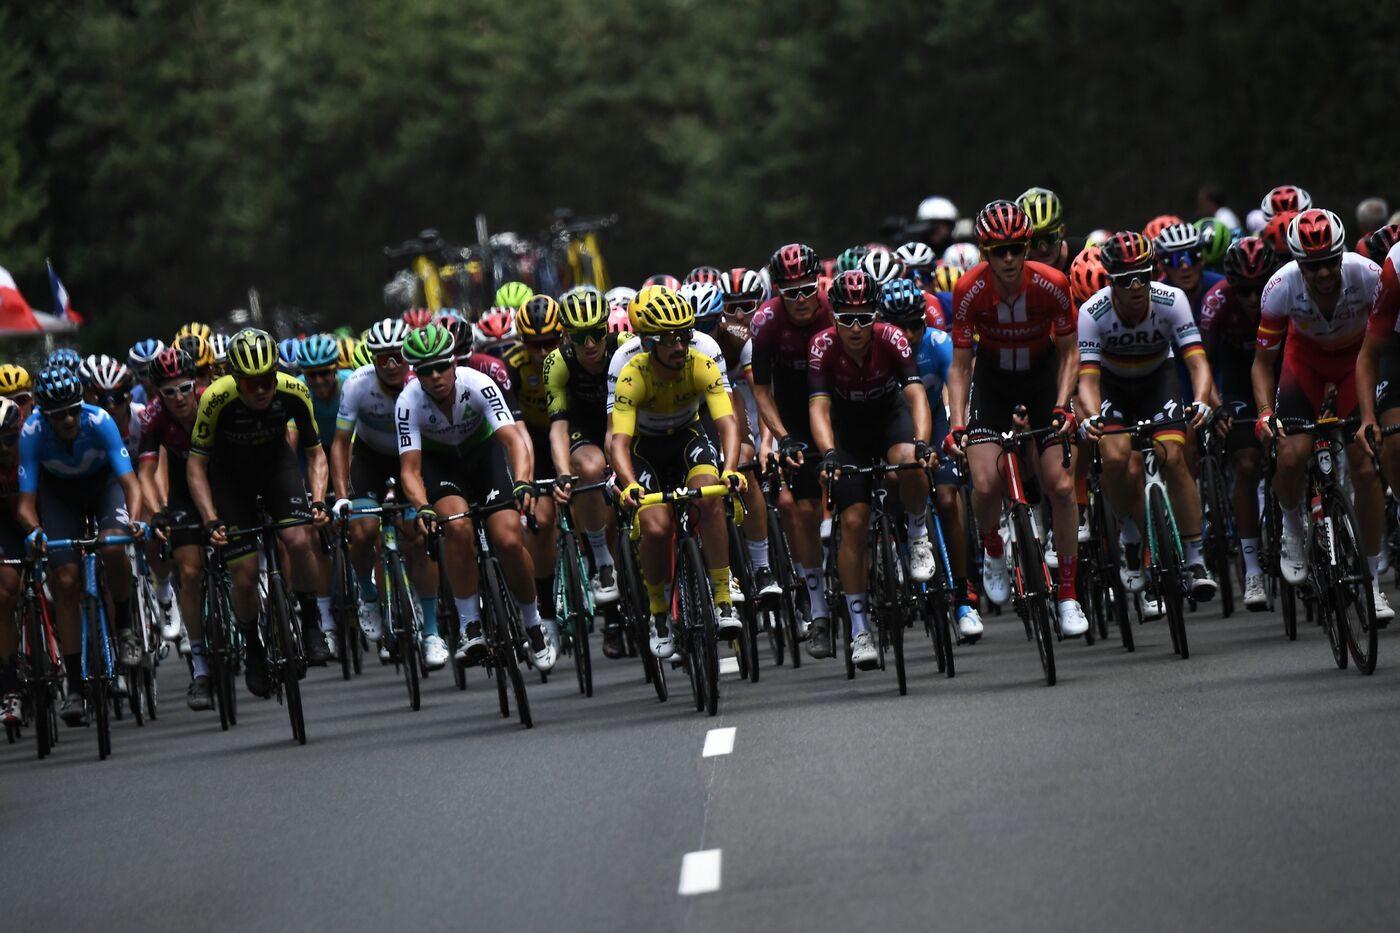 Tour de France Stage 11: Albi To Toulouse